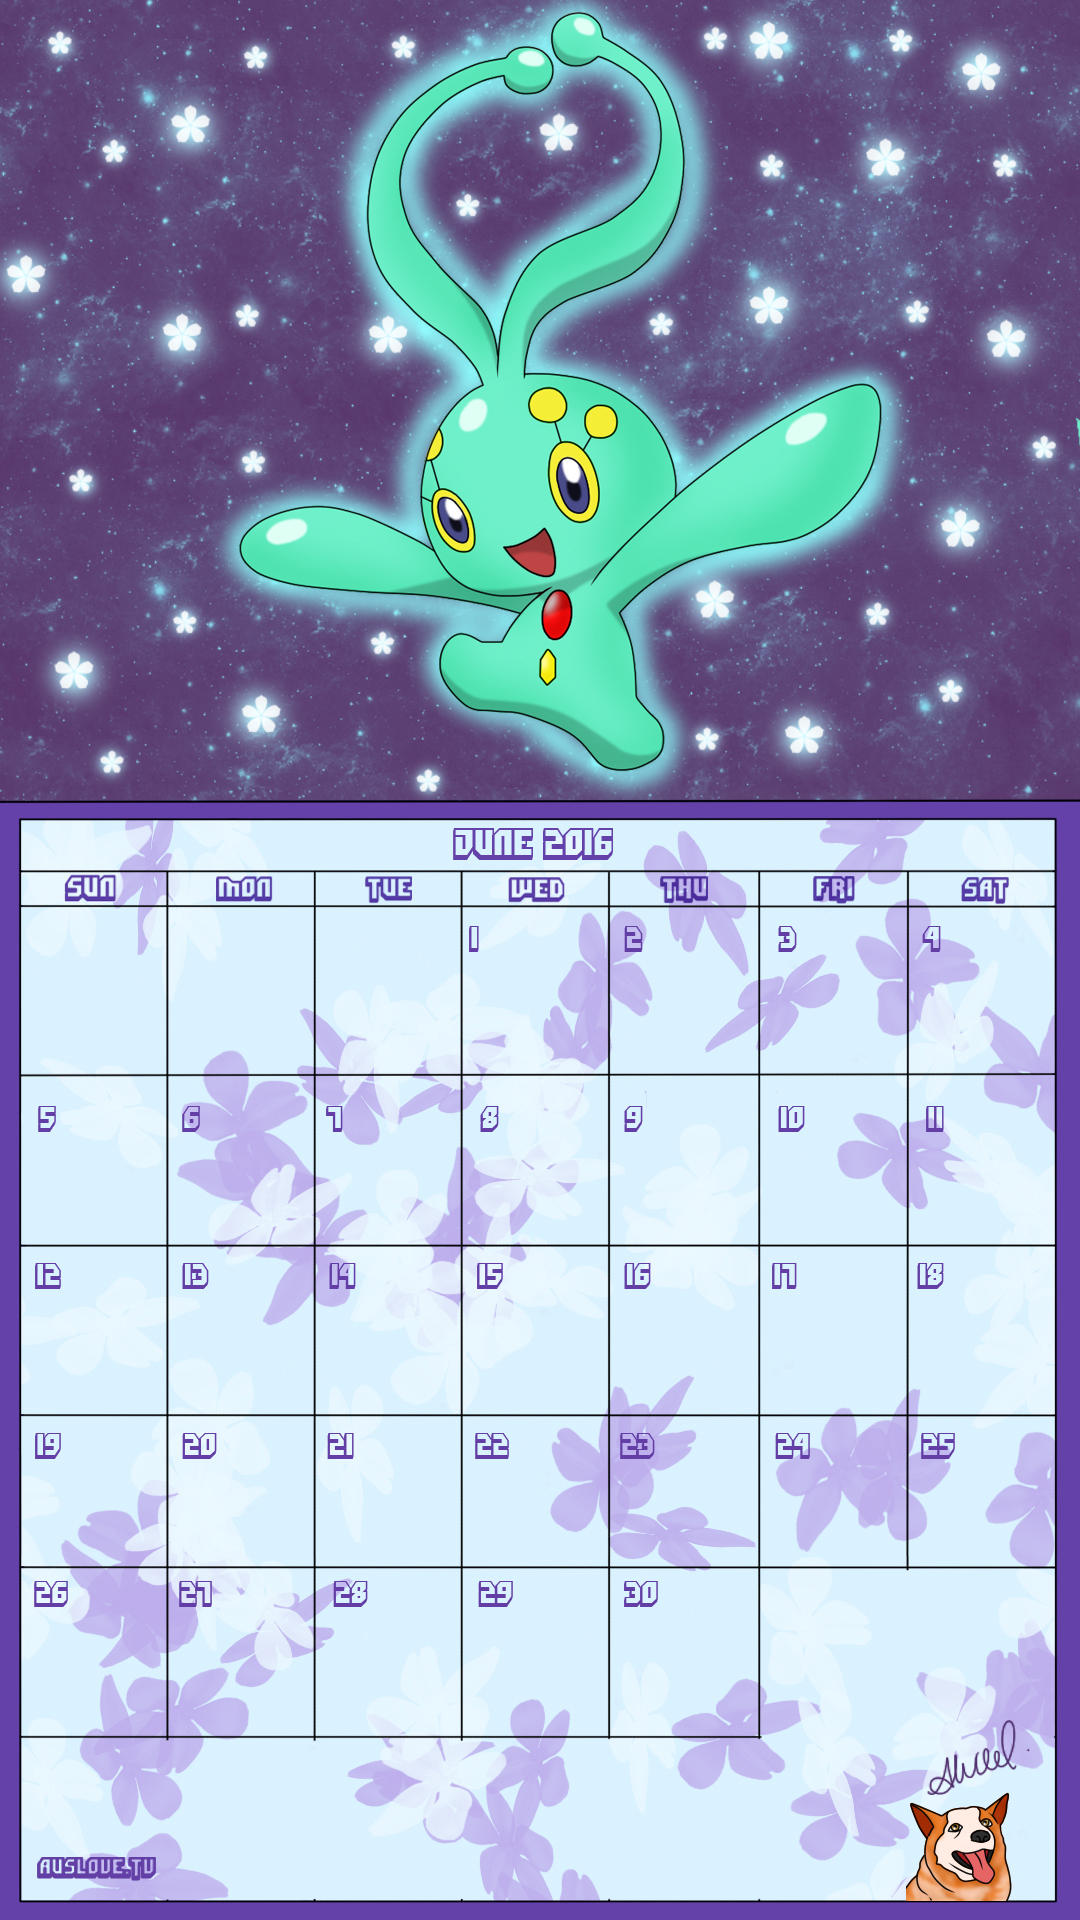 Pokemon 20th Anniversary Calender - June 2016 by AusLove